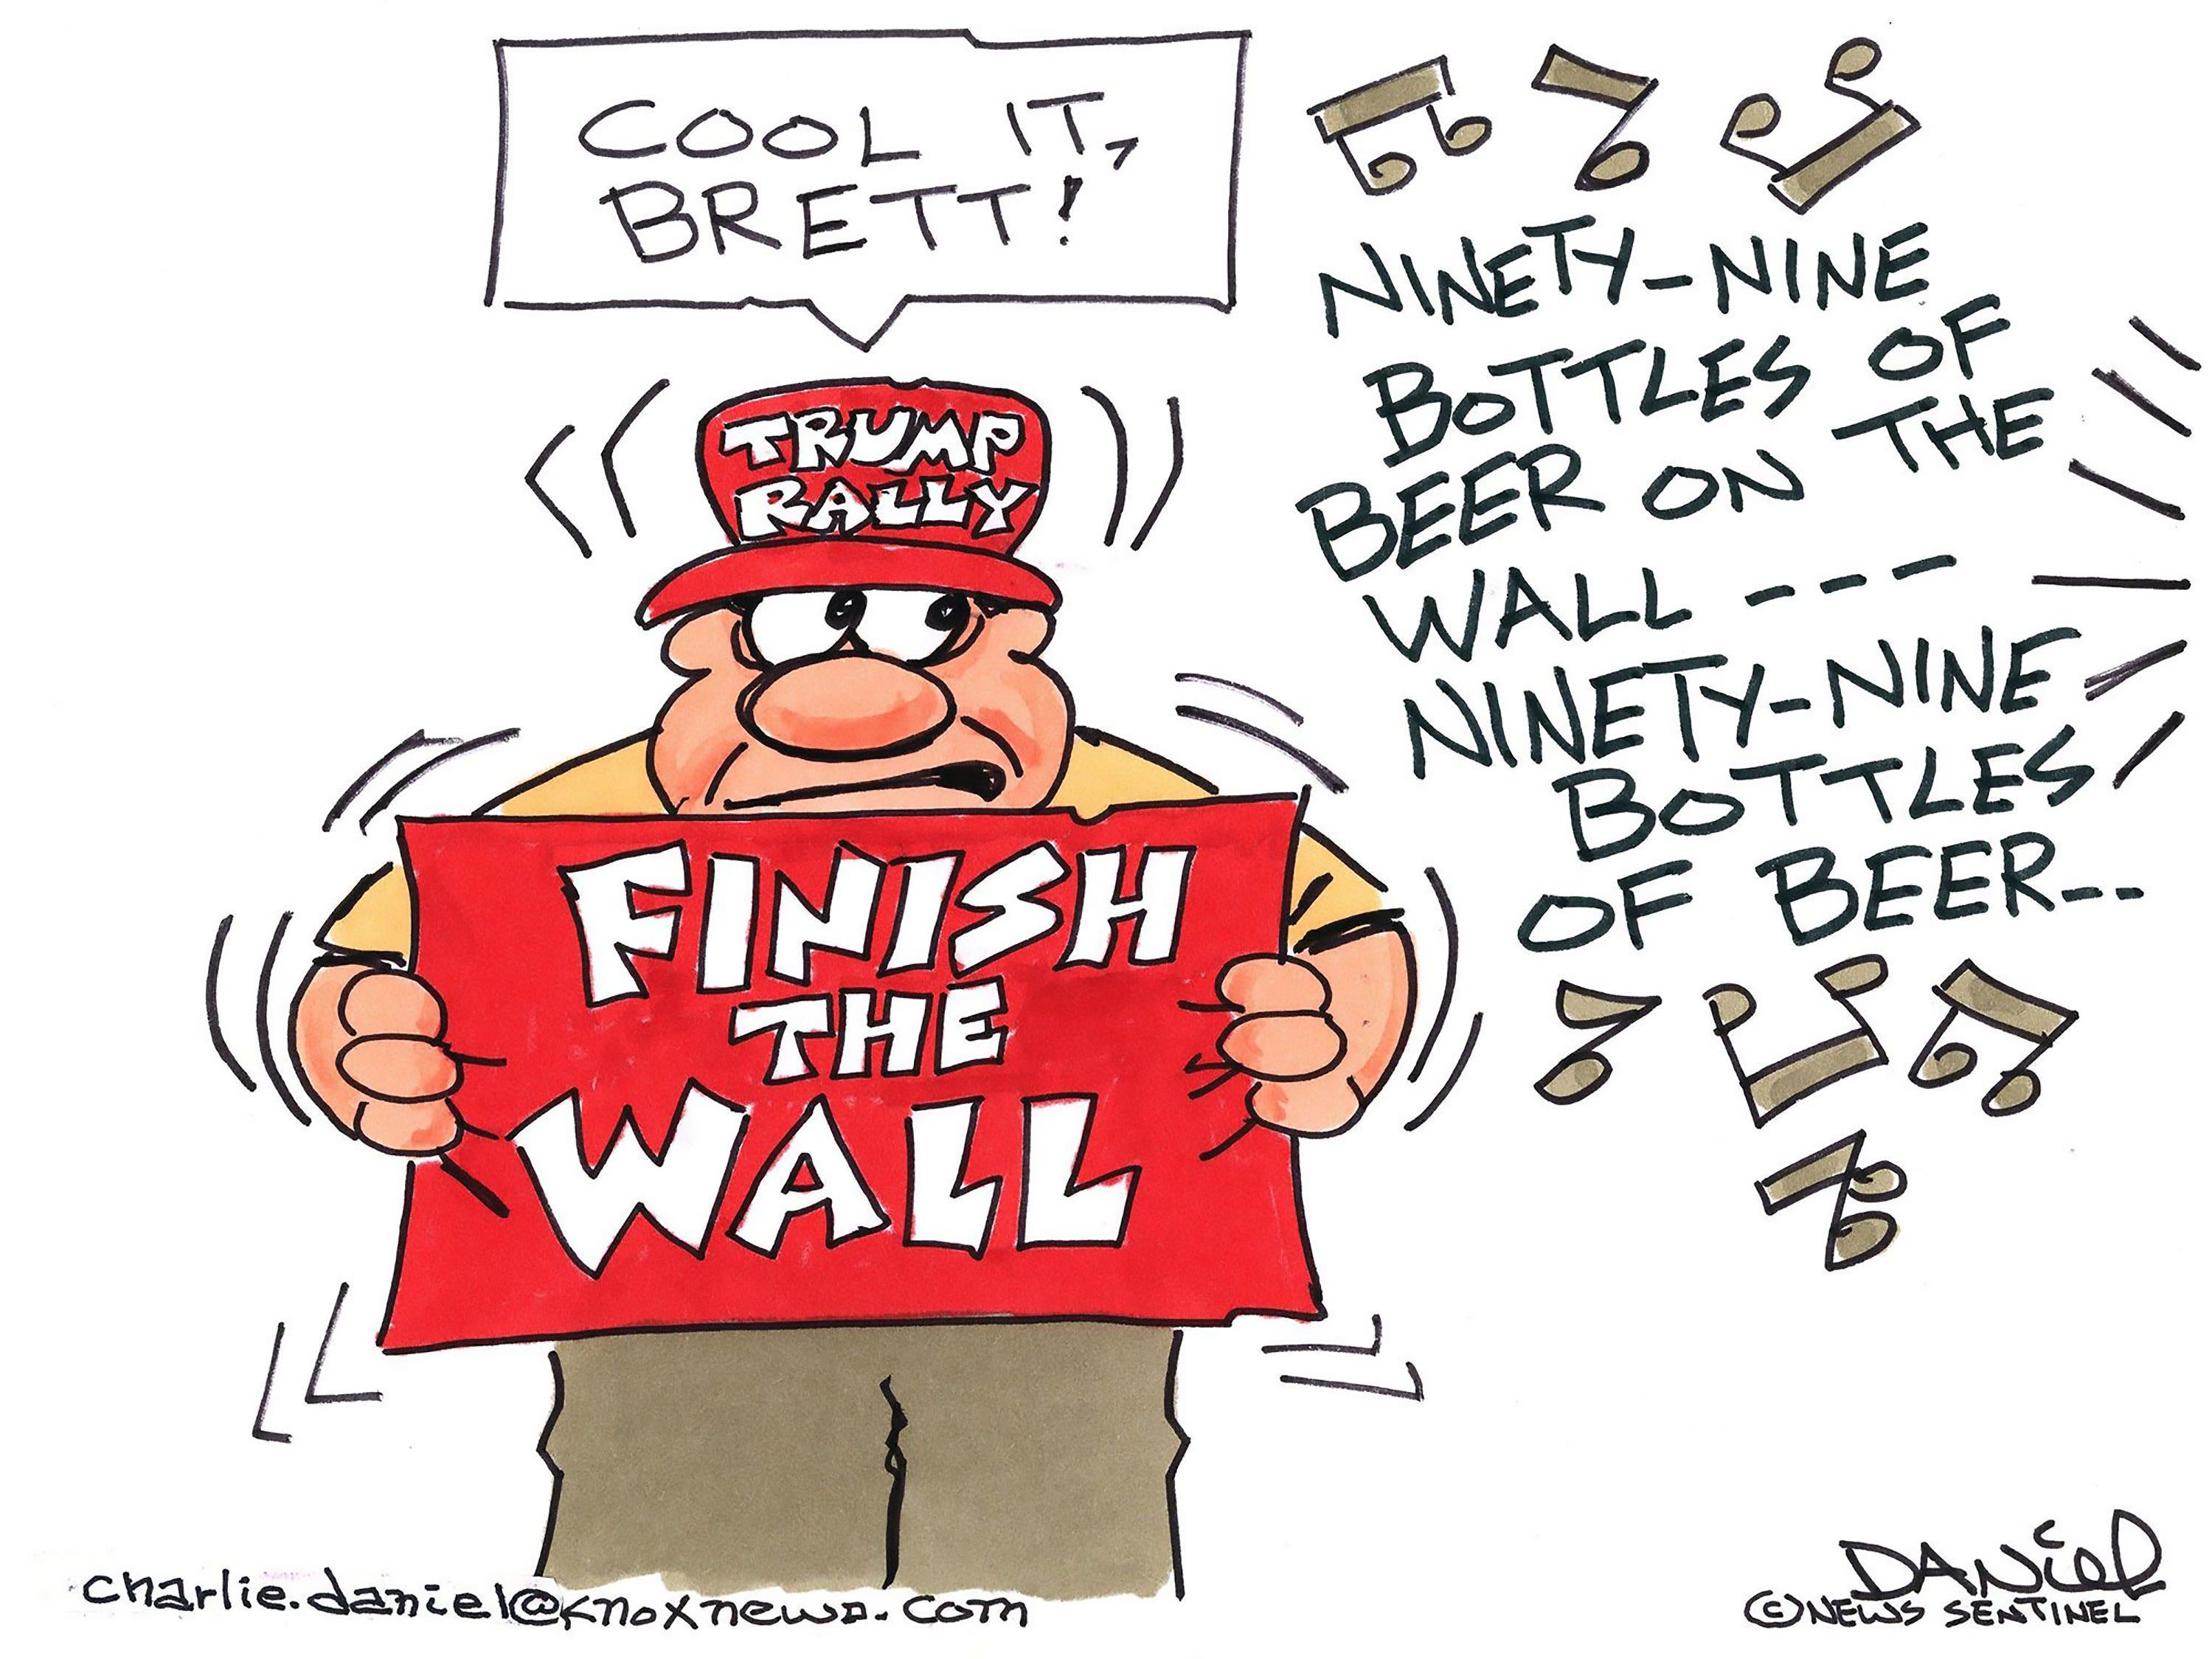 The cartoonist's homepage, knoxnews.com/opinion/charlie-daniel